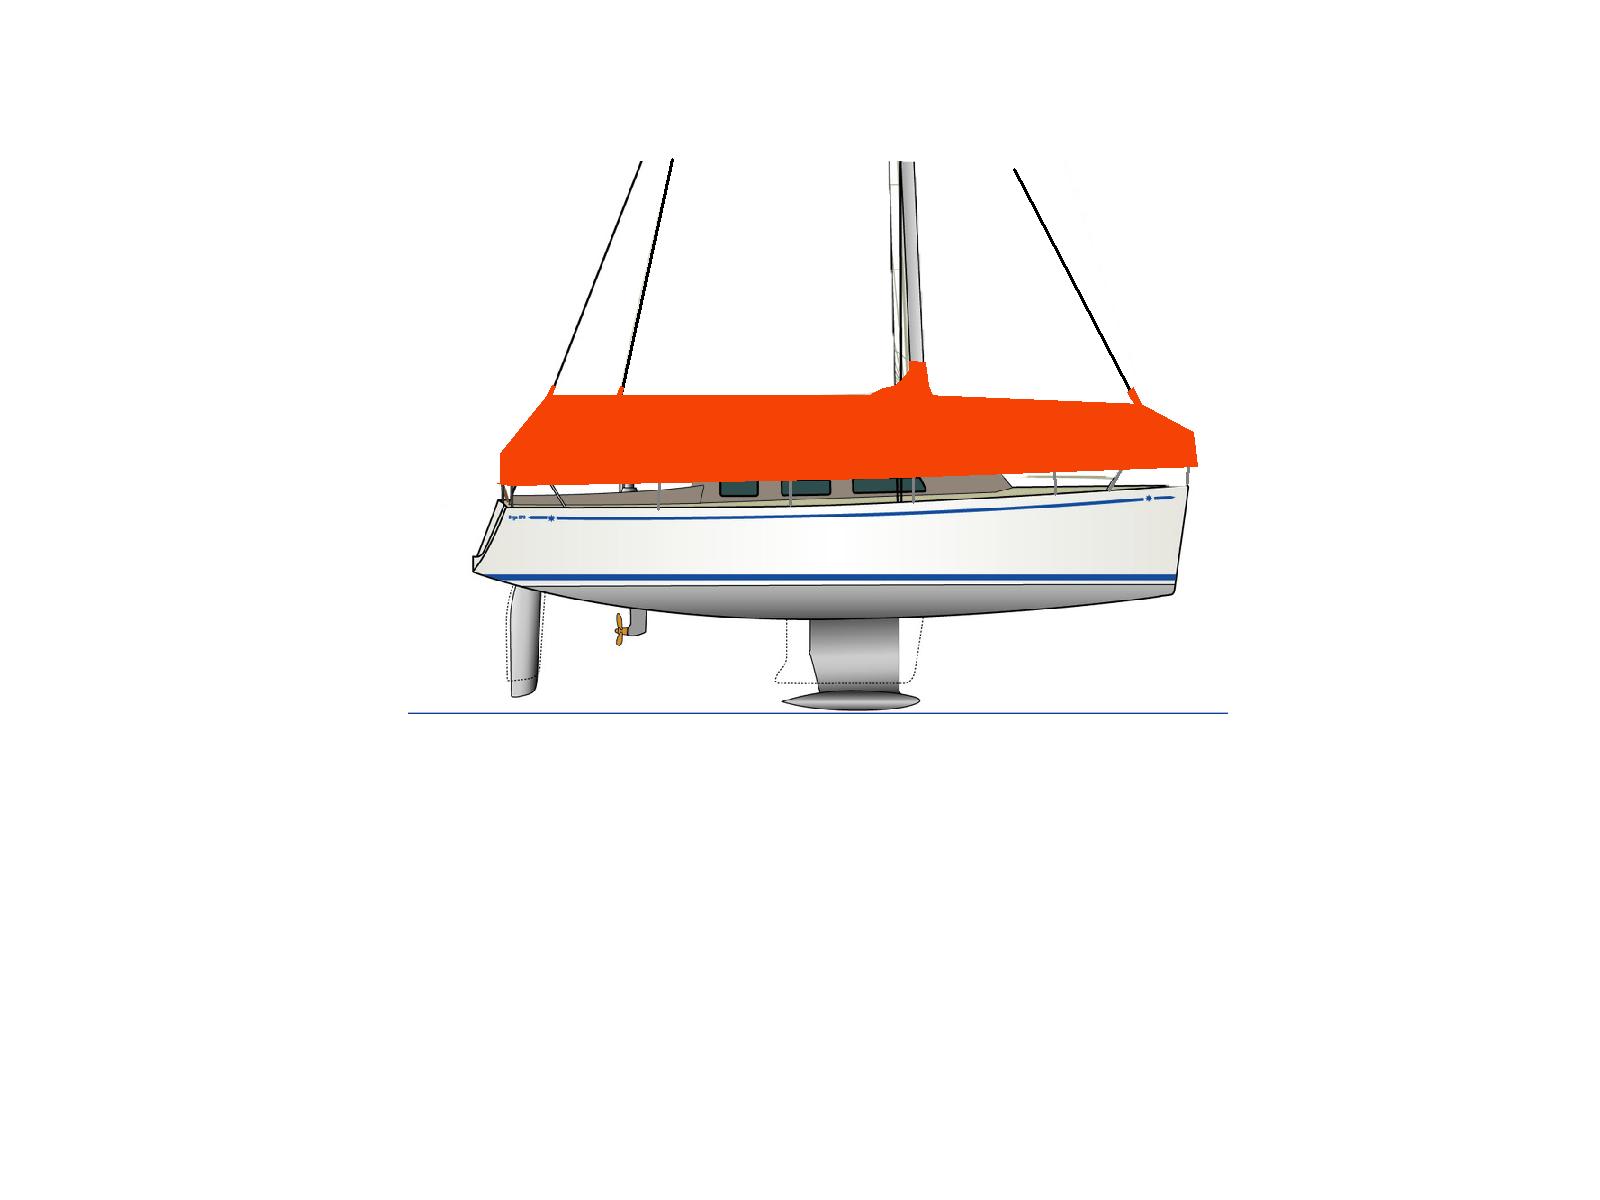 01 04 Typ D Segelboot GP  Rand ca. 20 cm.PNG